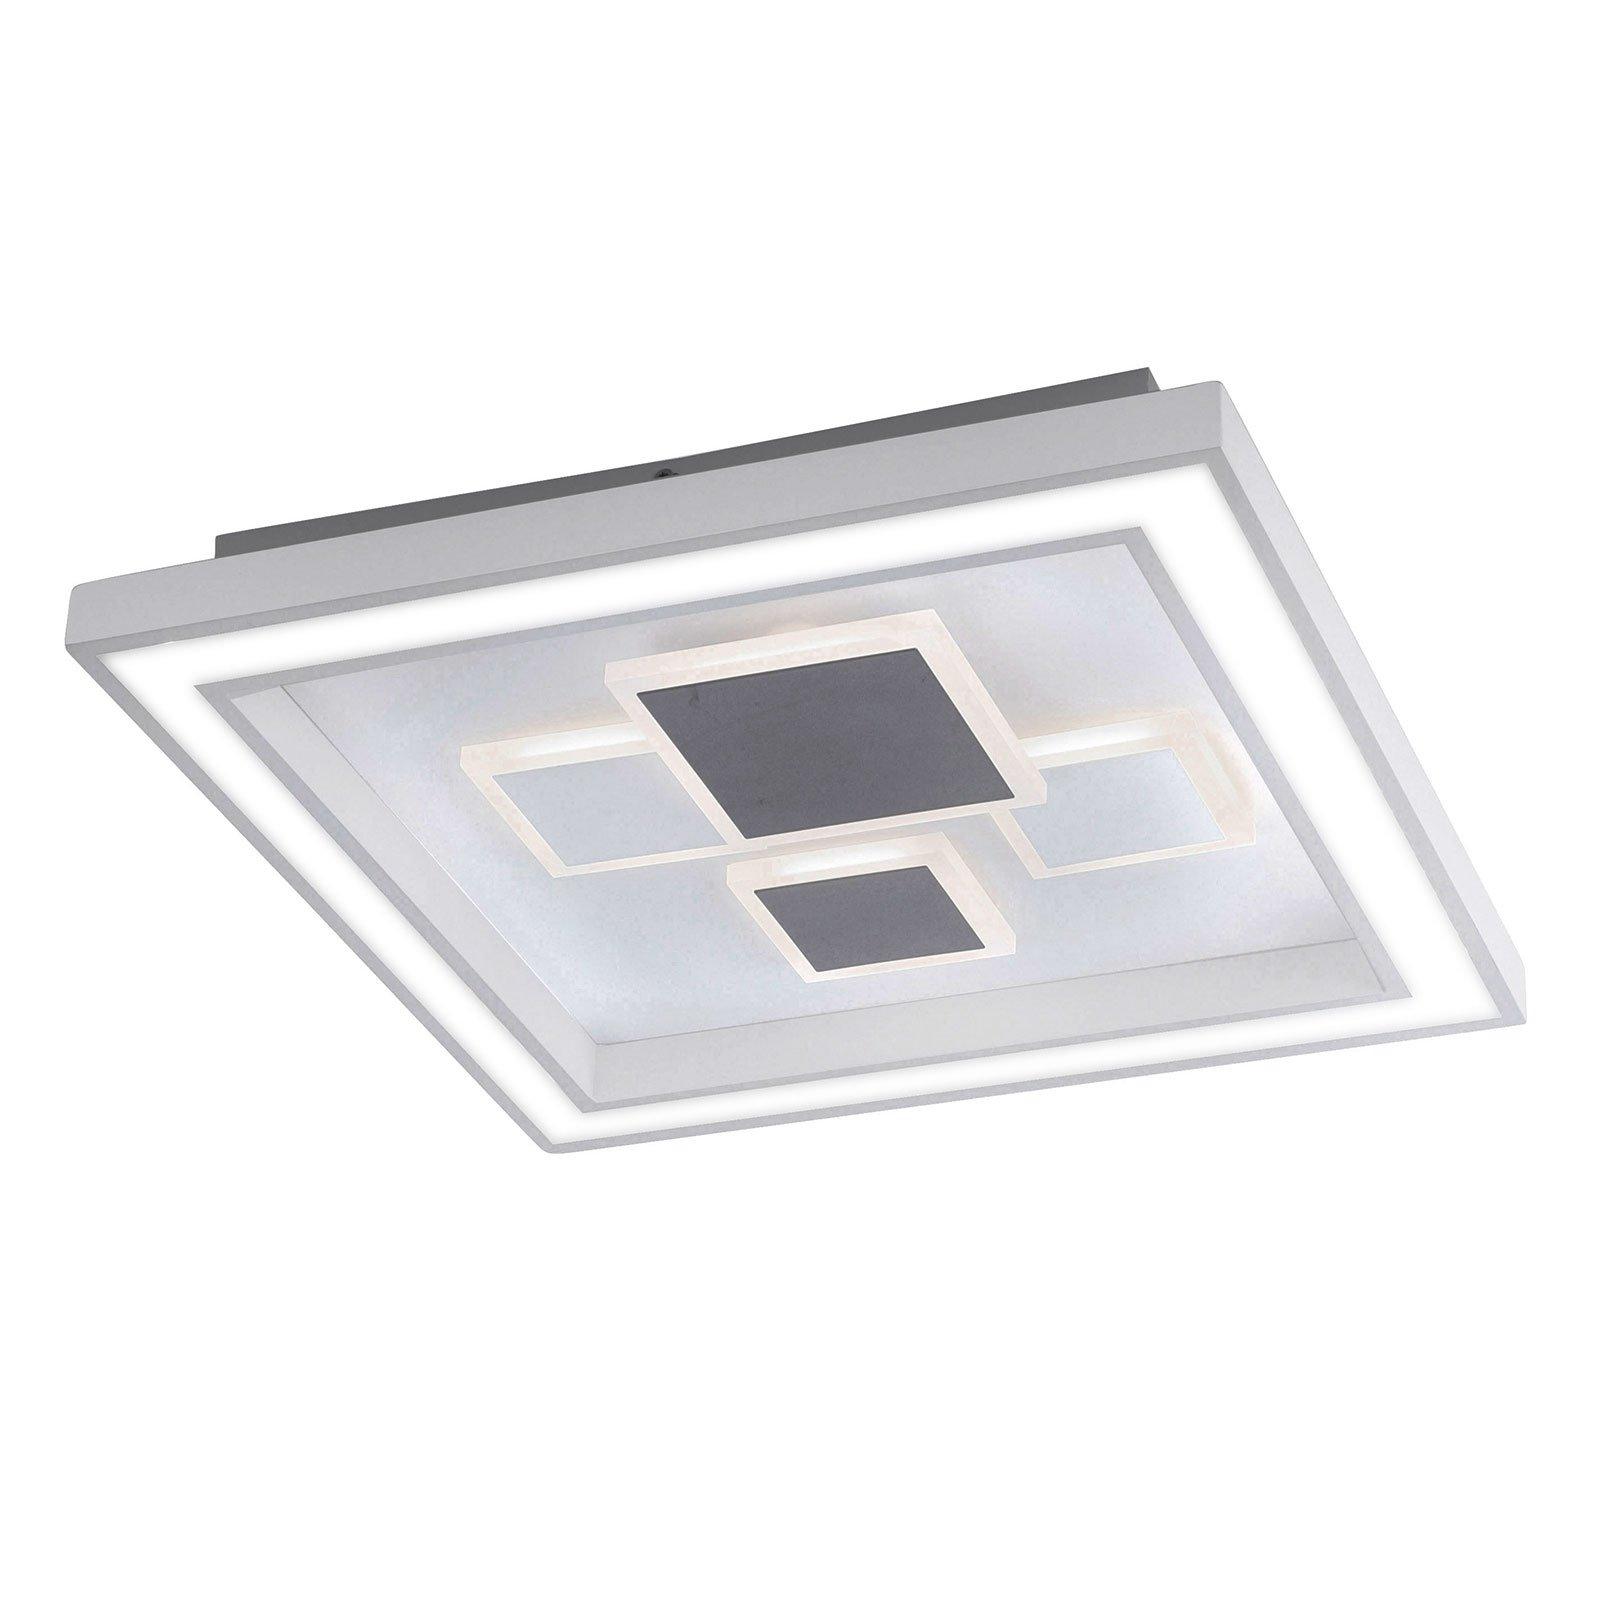 Paul Neuhaus Eliza LED-taklampe kvadratisk